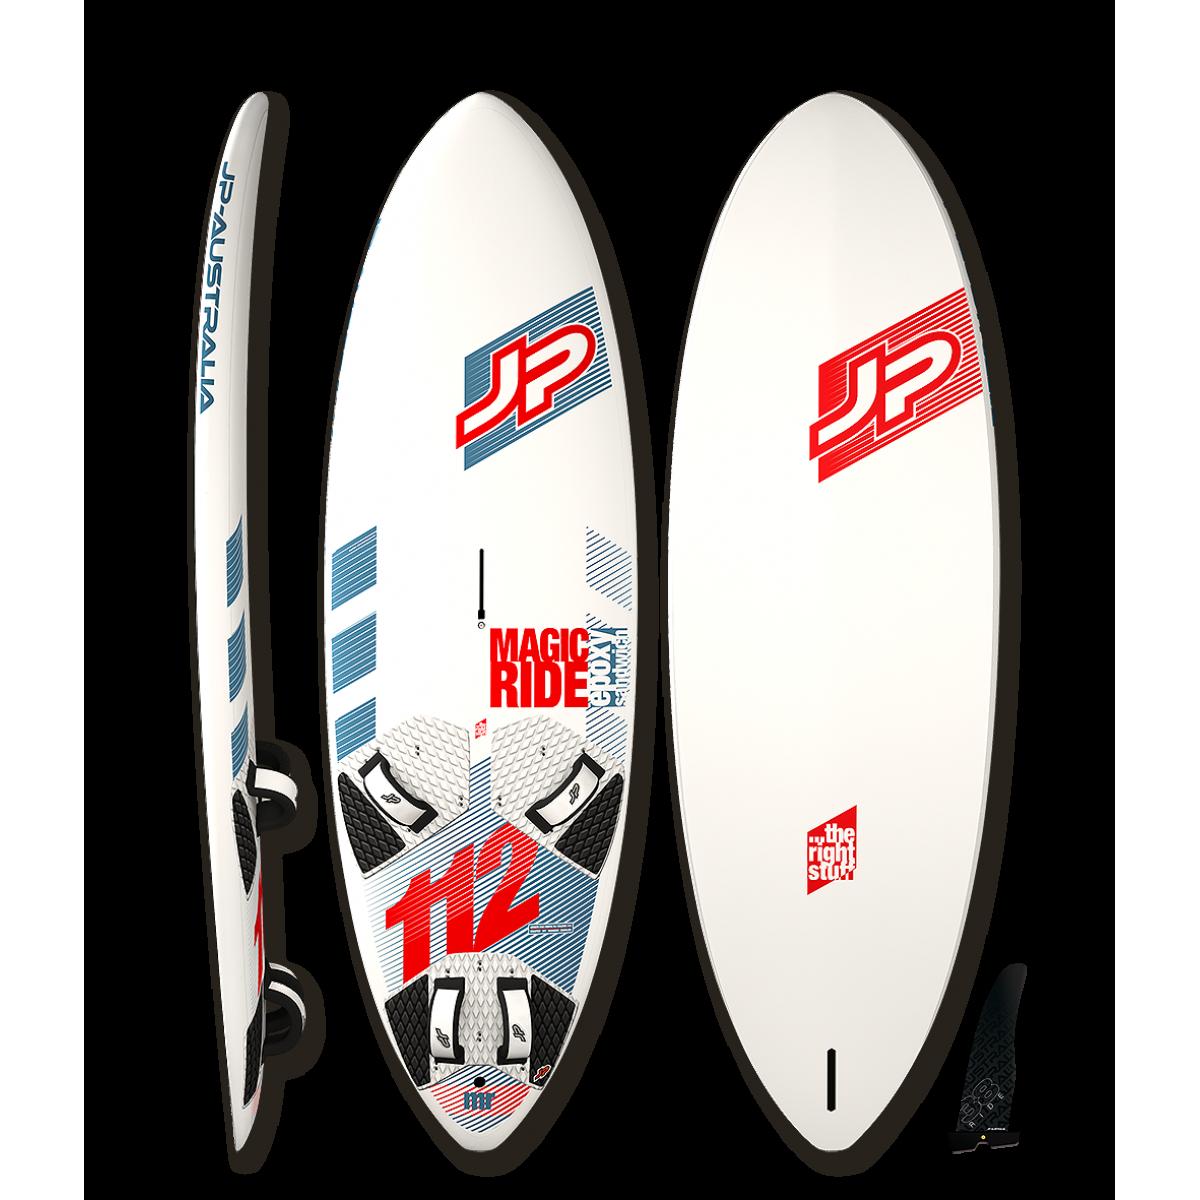 JP Magic ride ES - Family 2019 - Boards - Windsurfing